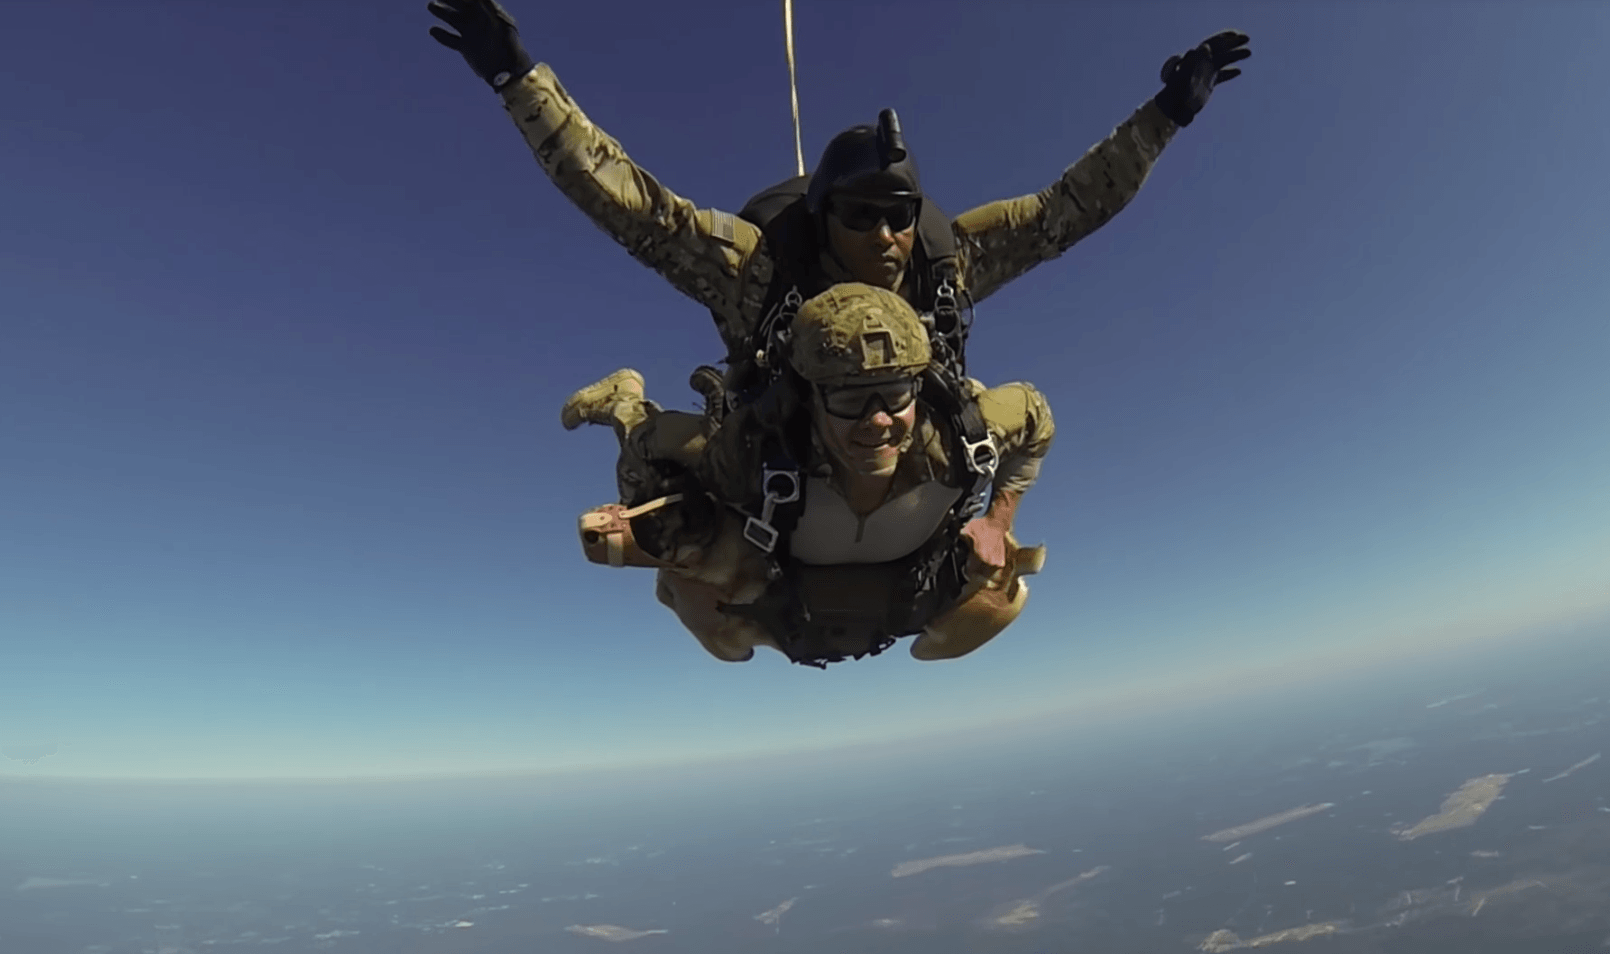 military Dog skydiving